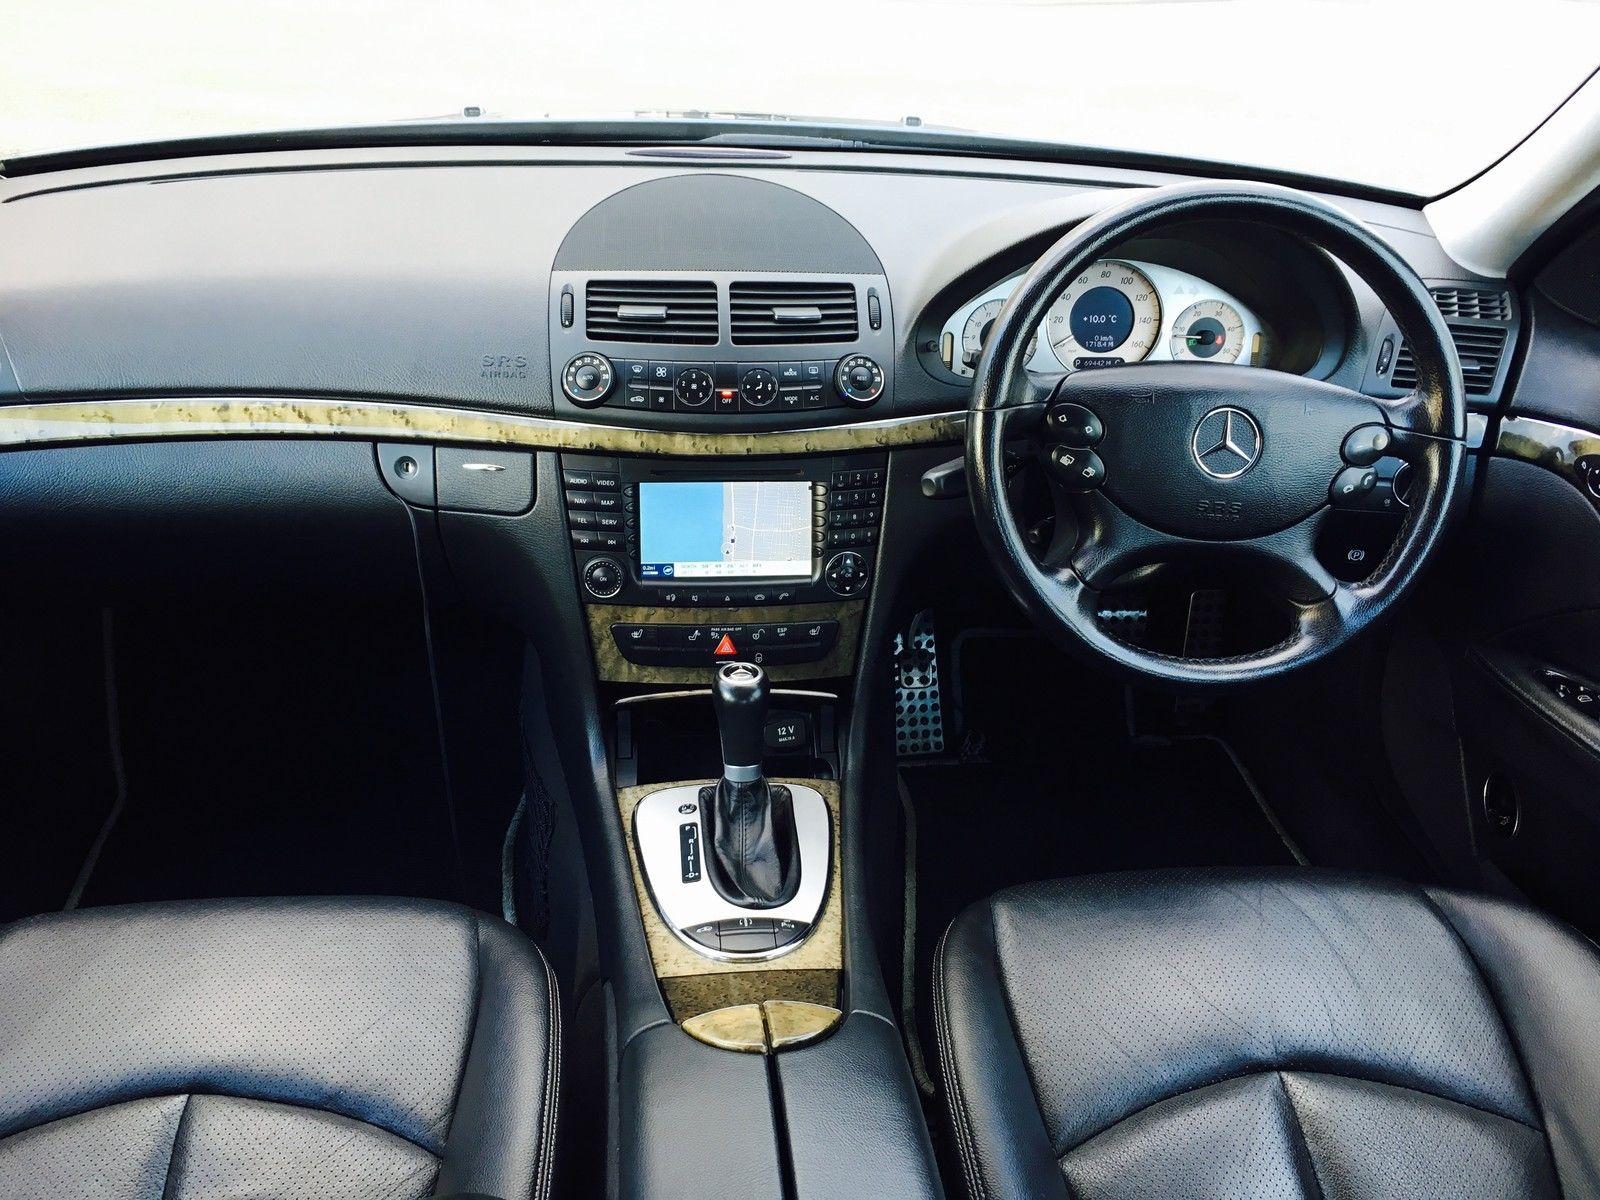 2005 Mercedes Benz E320 Cdi Sport Auto Grey M Cars